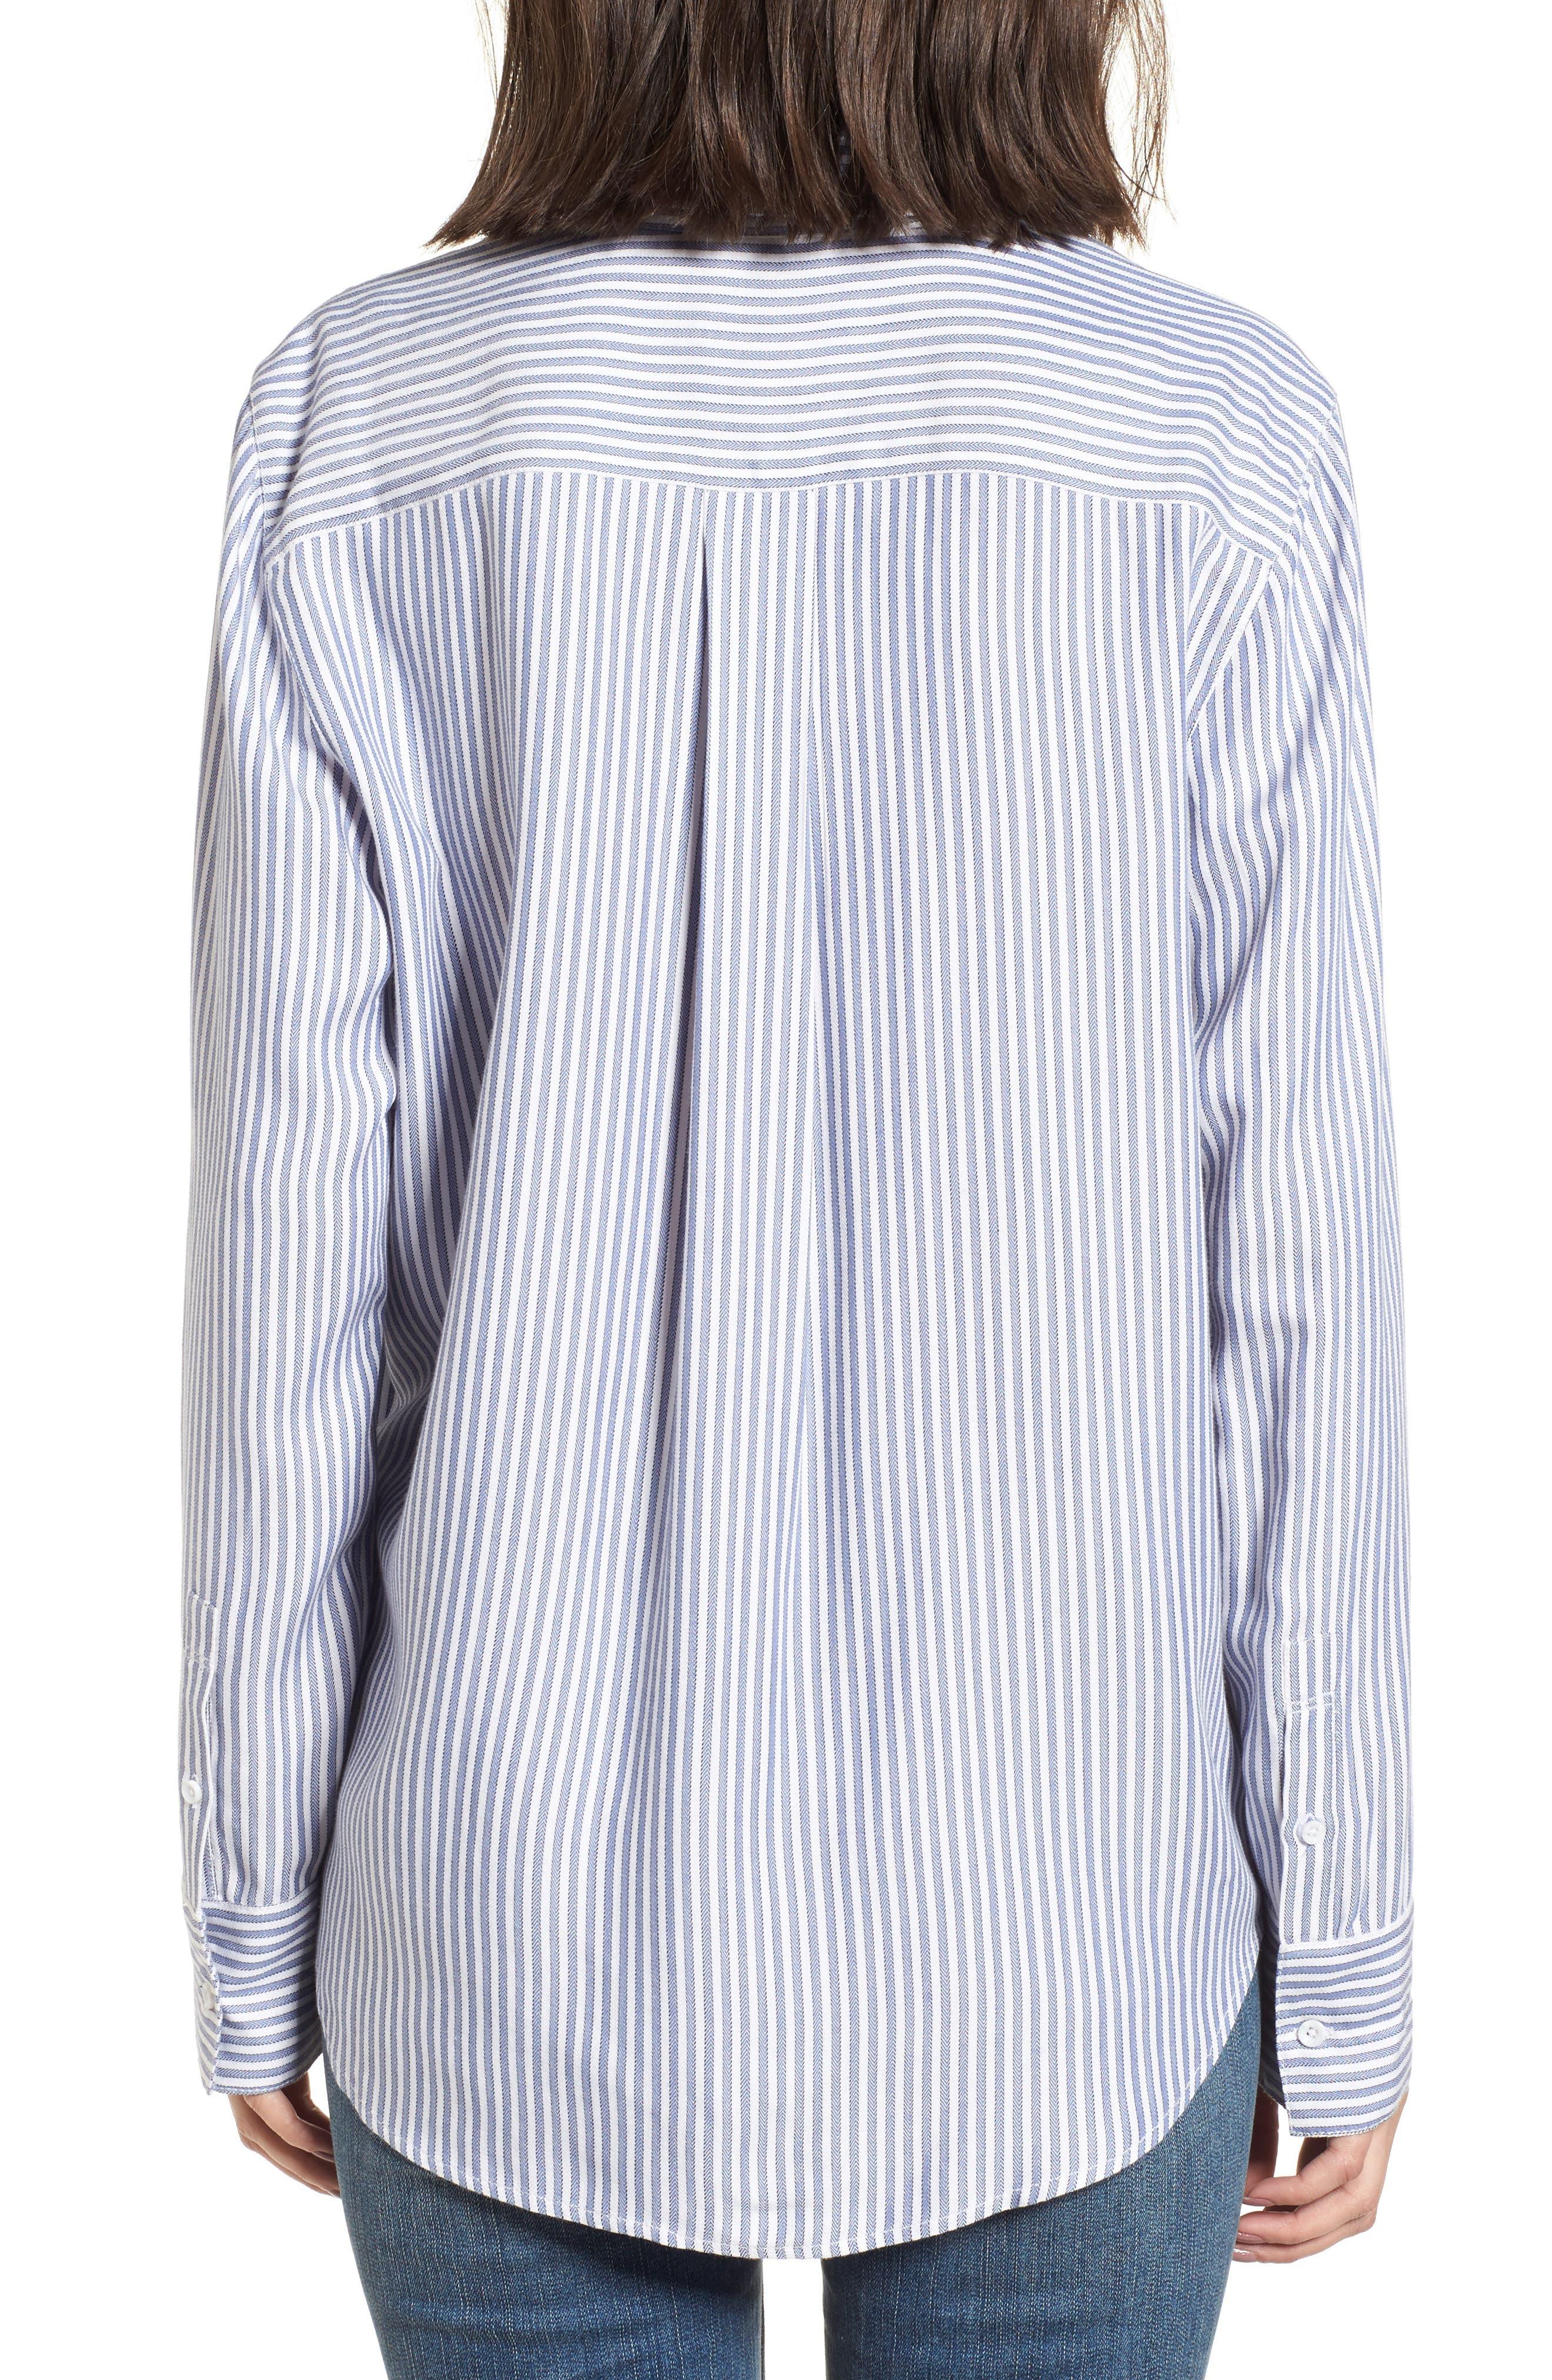 Stripe Ruffle Shirt,                             Alternate thumbnail 2, color,                             White Double Oxford Stripe